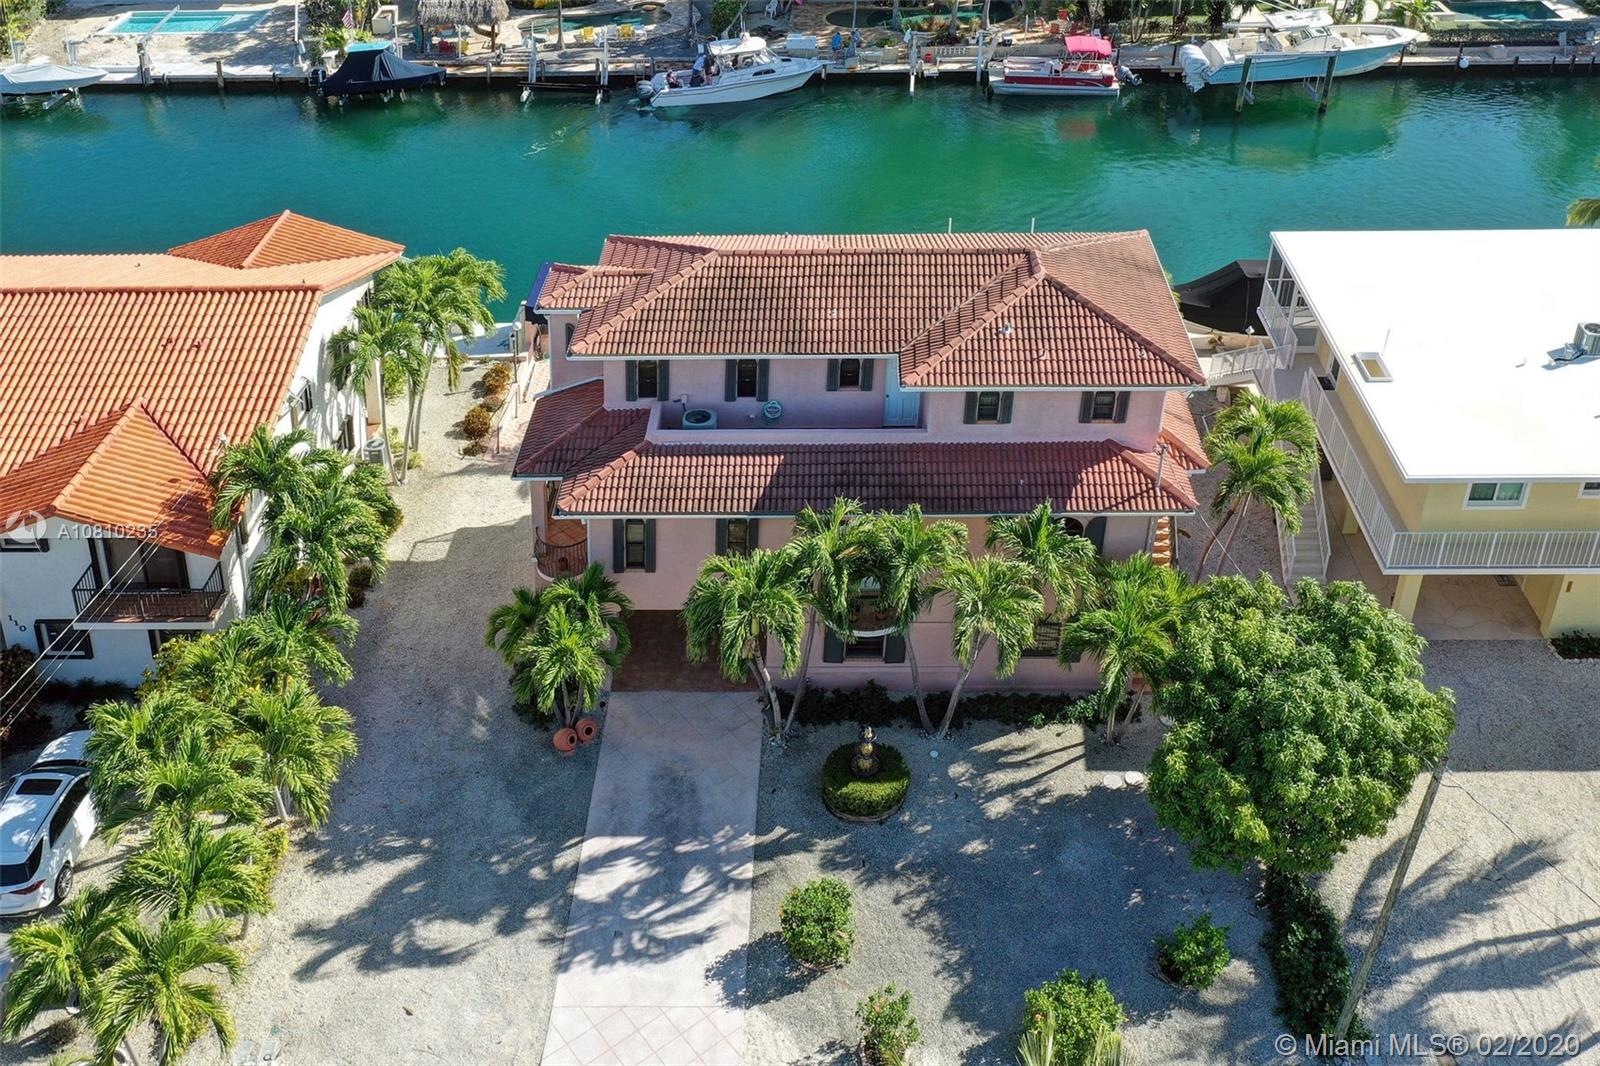 112 Villa Bella Dr, Islamorada, FL 33036